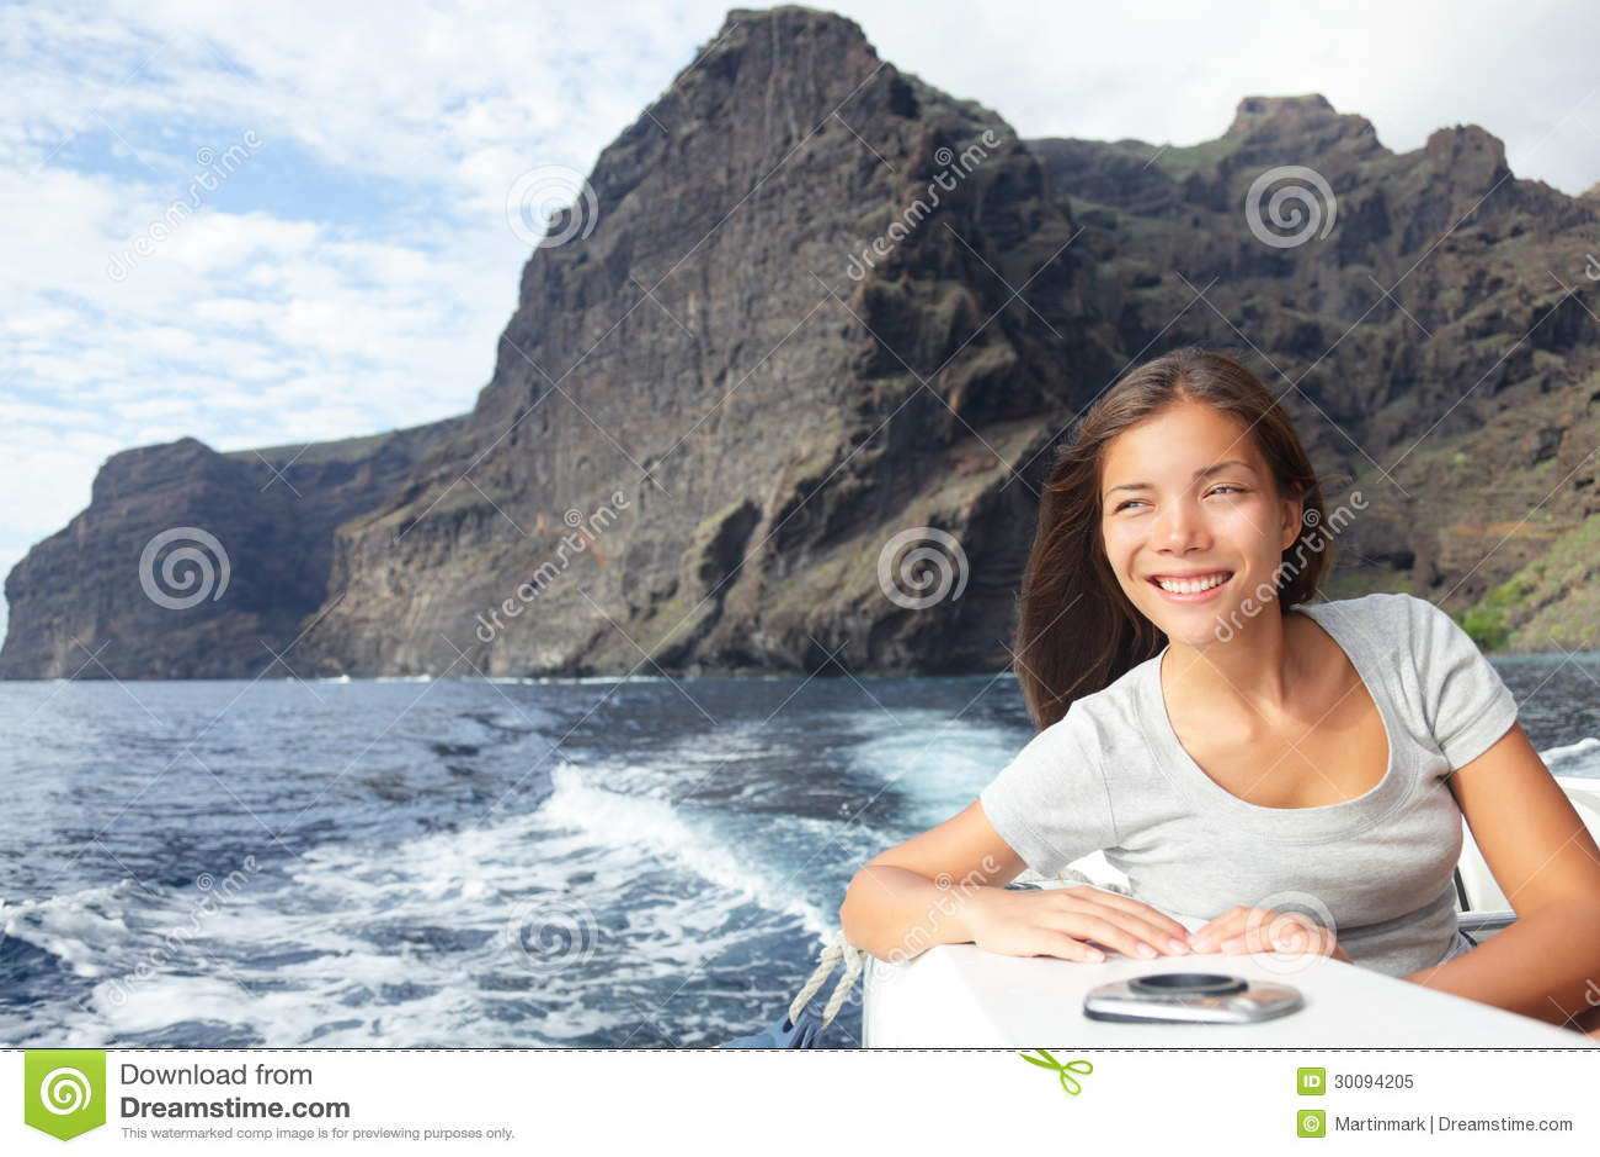 Woman On Boat Sailing Looking At Ocean Royalty Free Stock ...